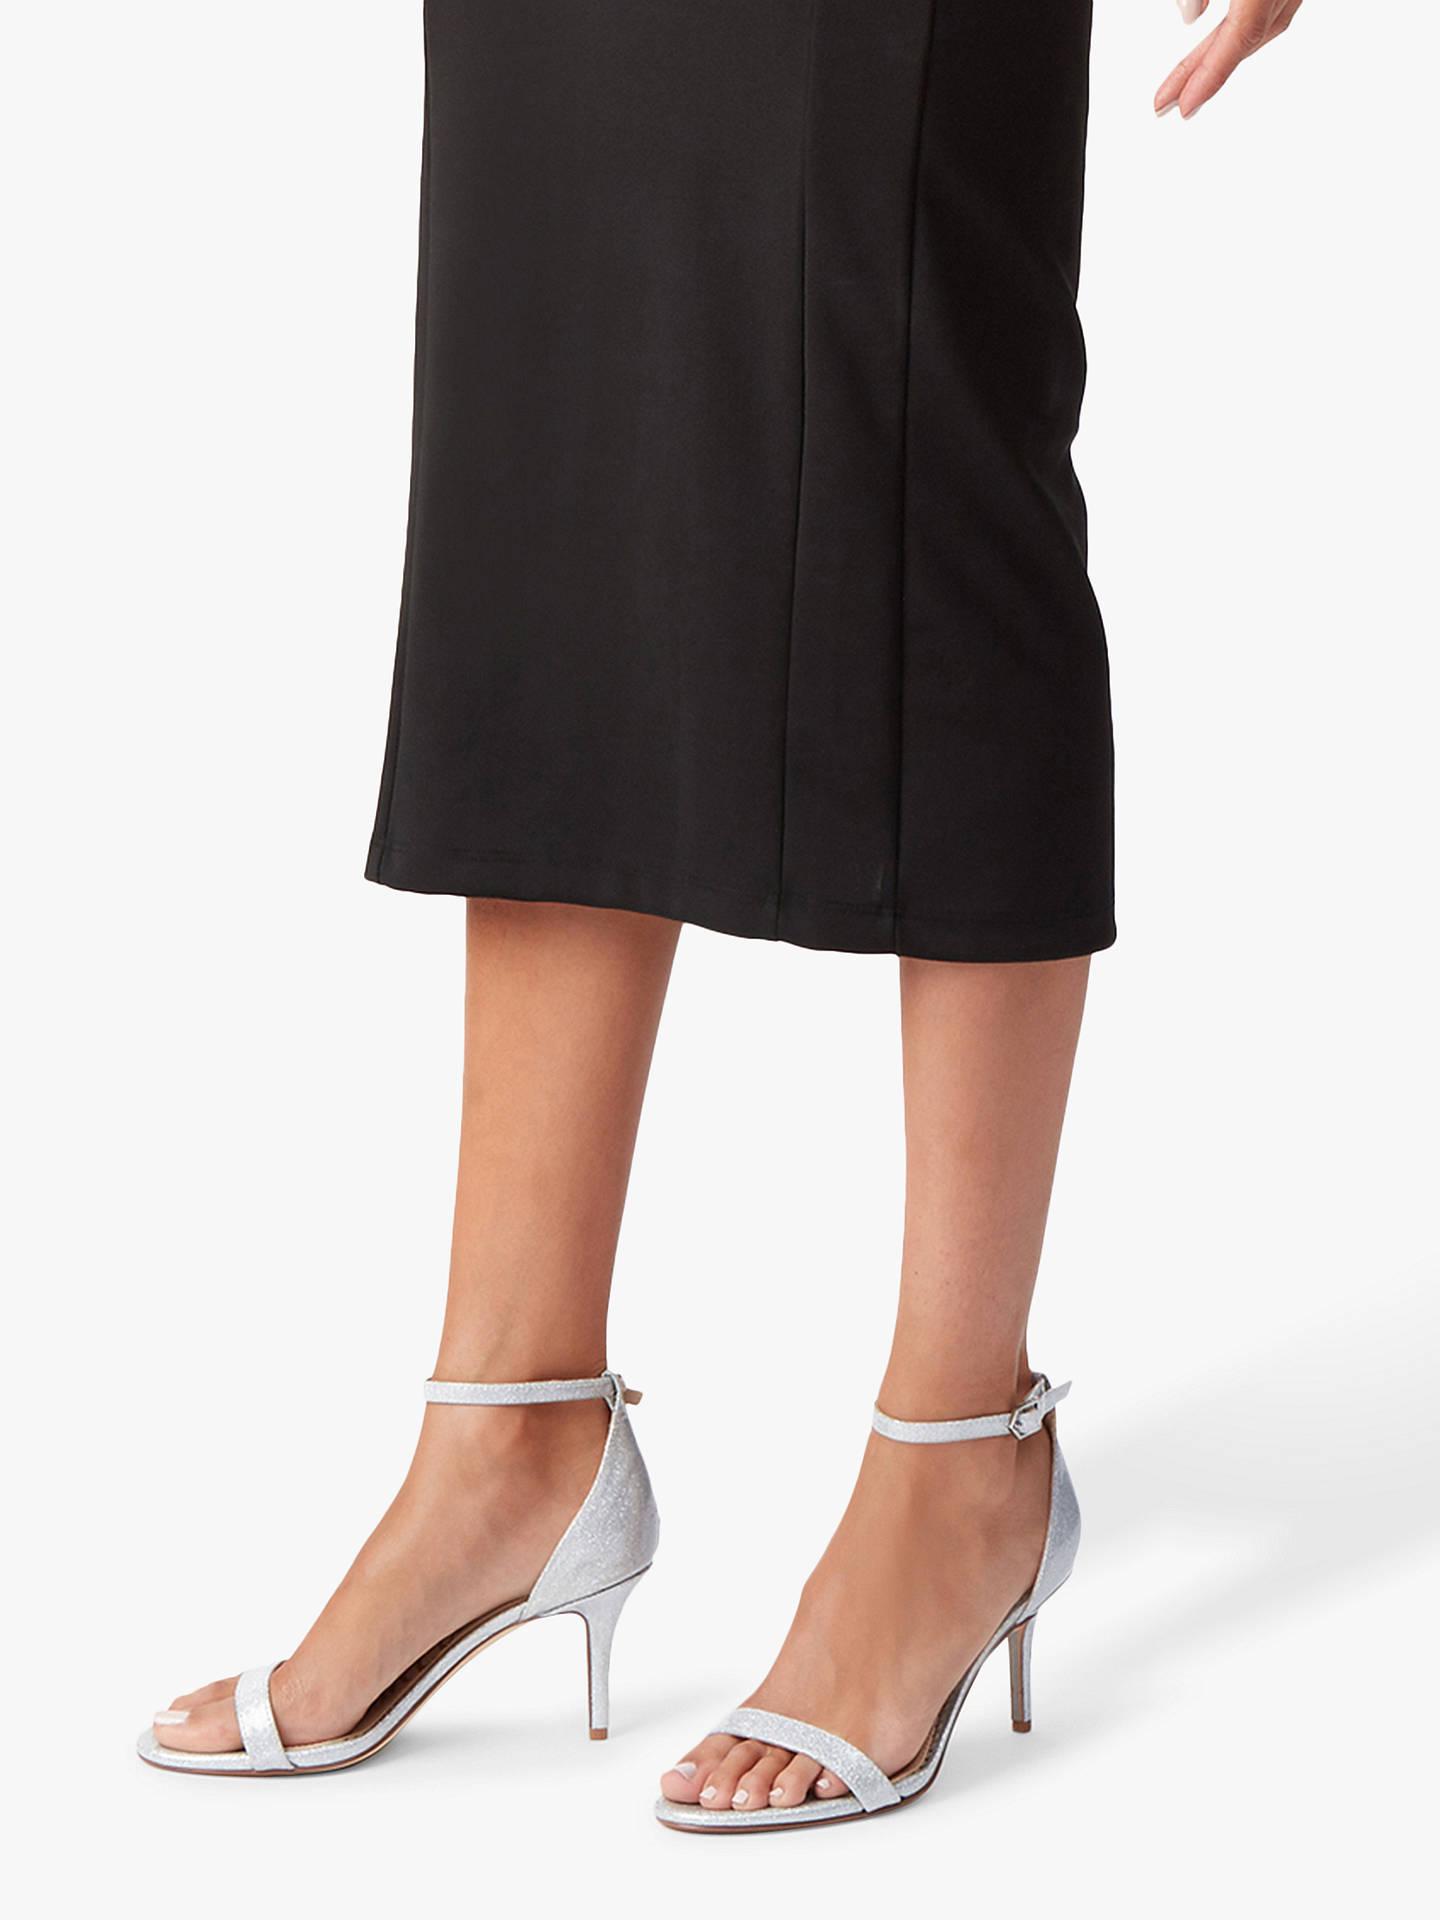 26fd4219096551 Buy Sam Edelman Patti Ankle Strap Heeled Sandals